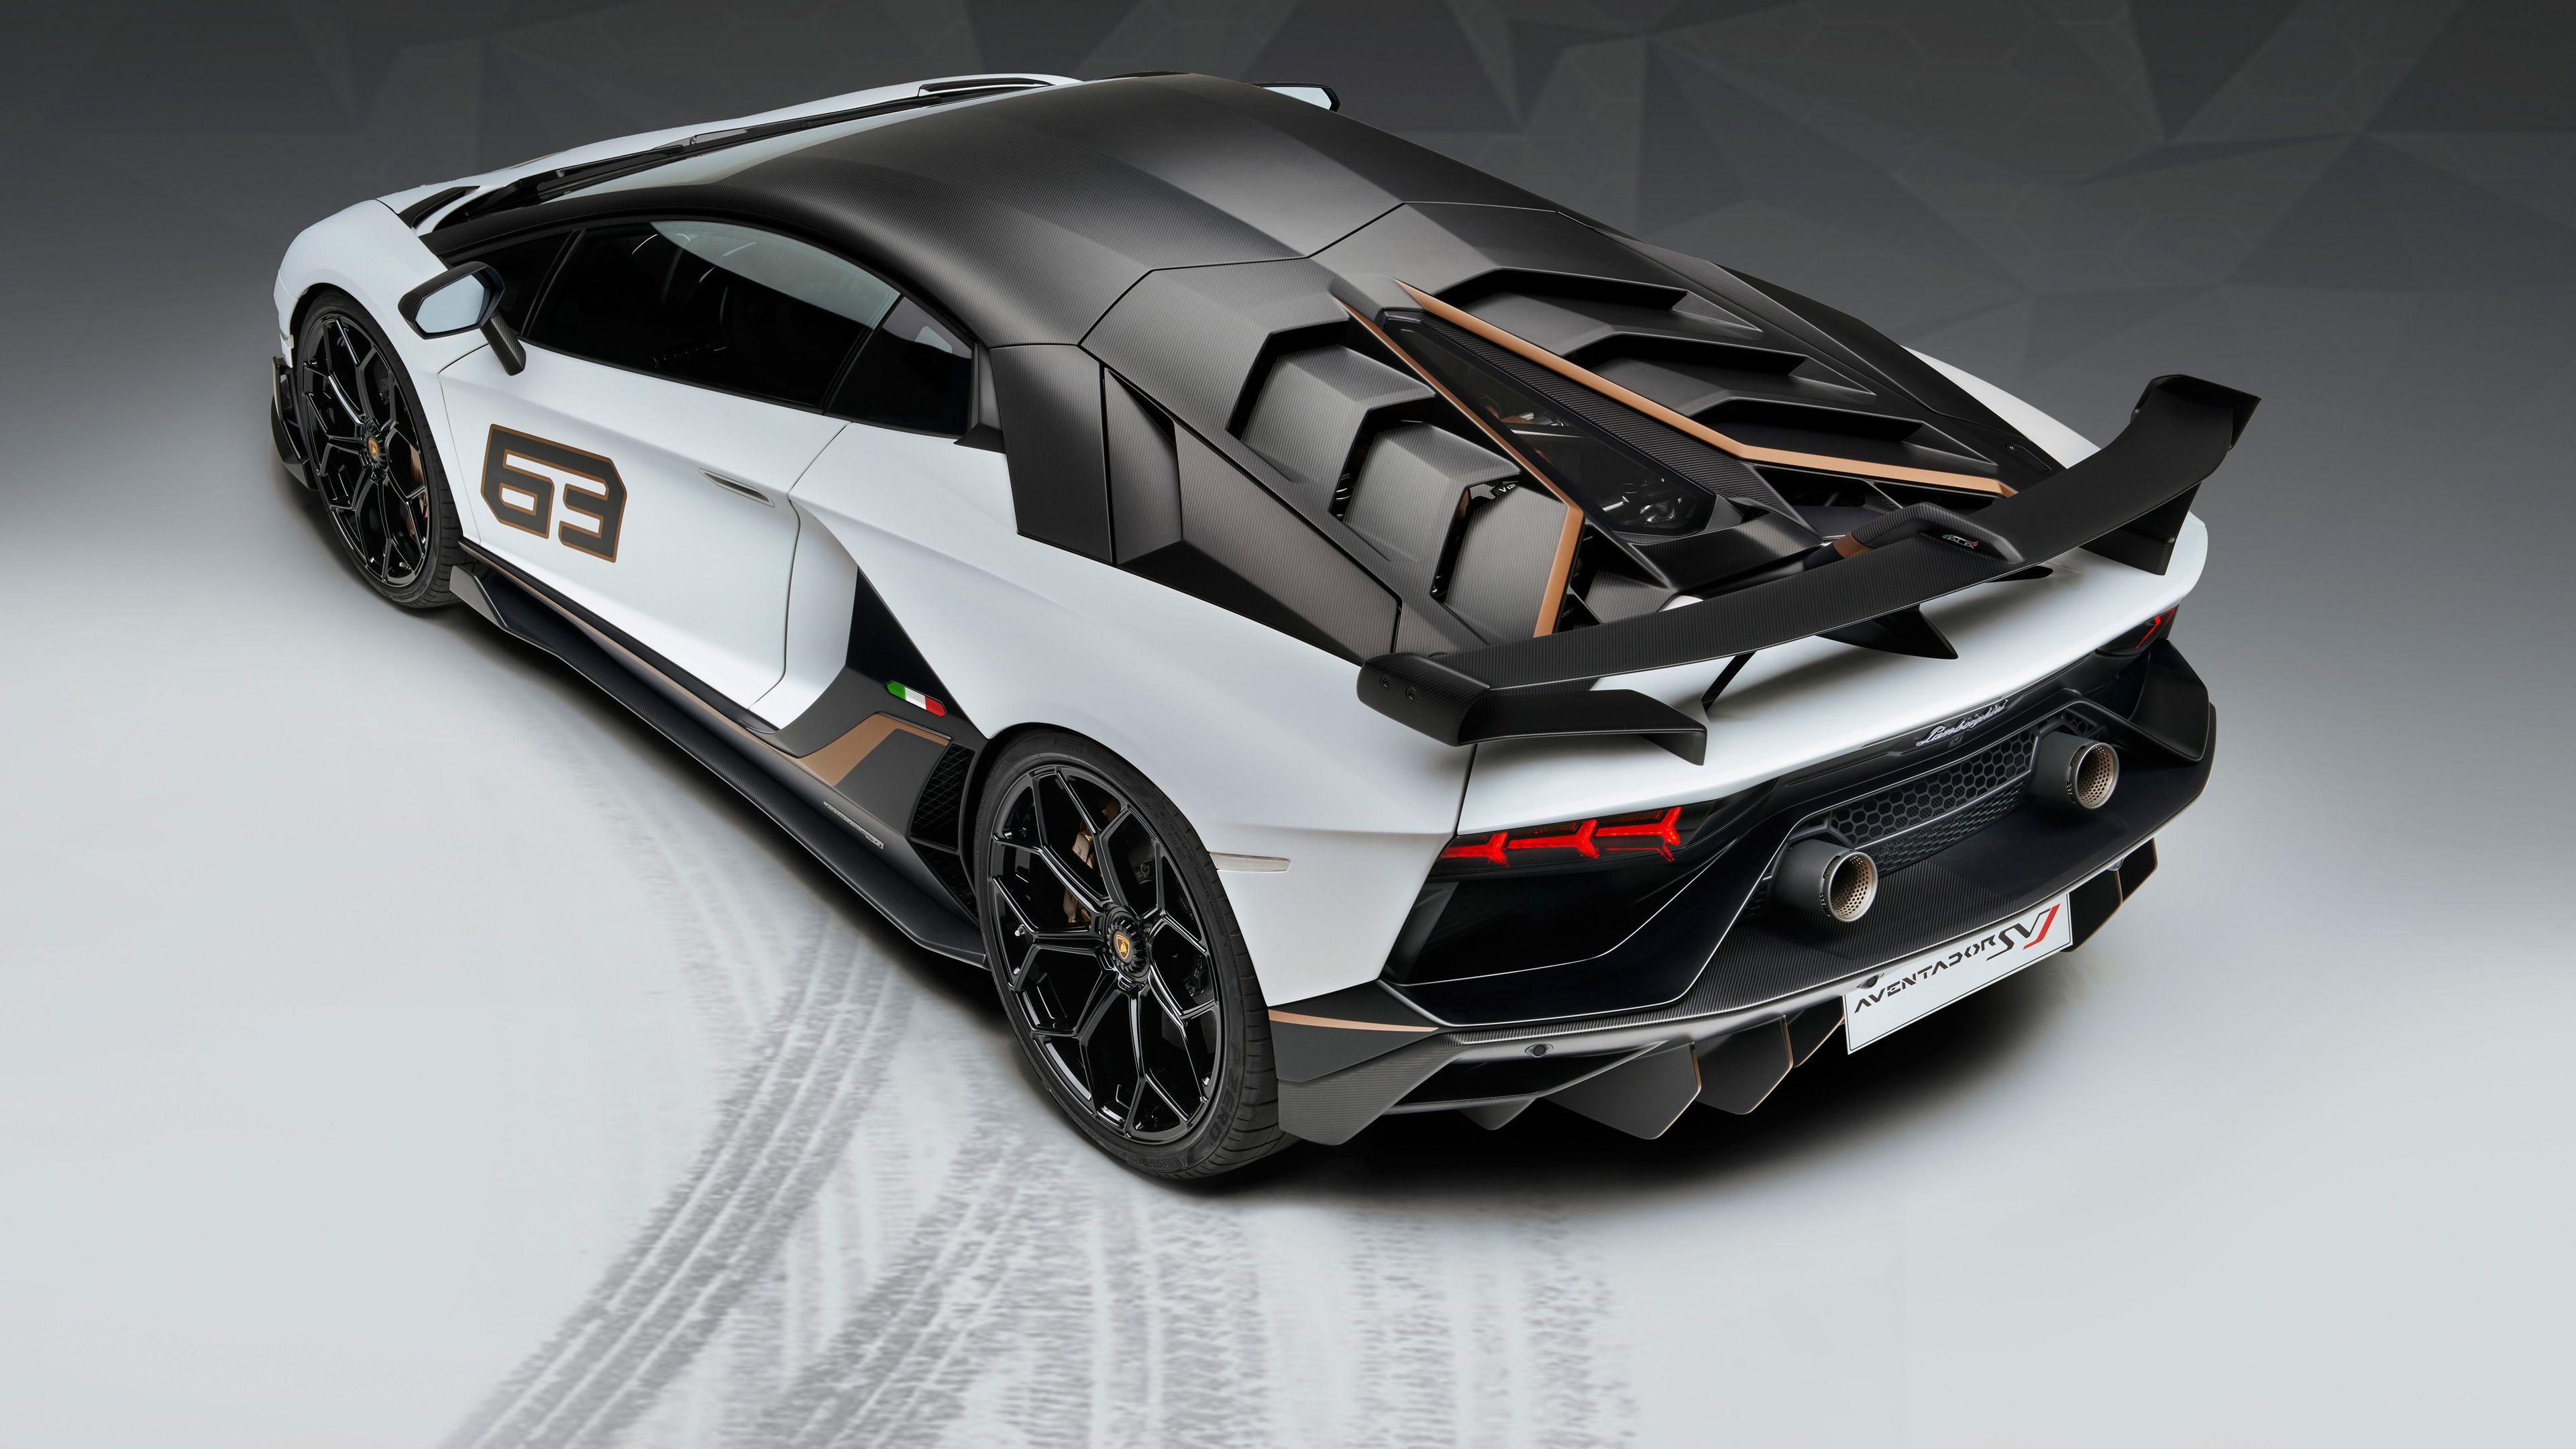 Lamborghini Aventador SVJ 63 2018 Rear lamborghini wallpapers, lamborghini avent…